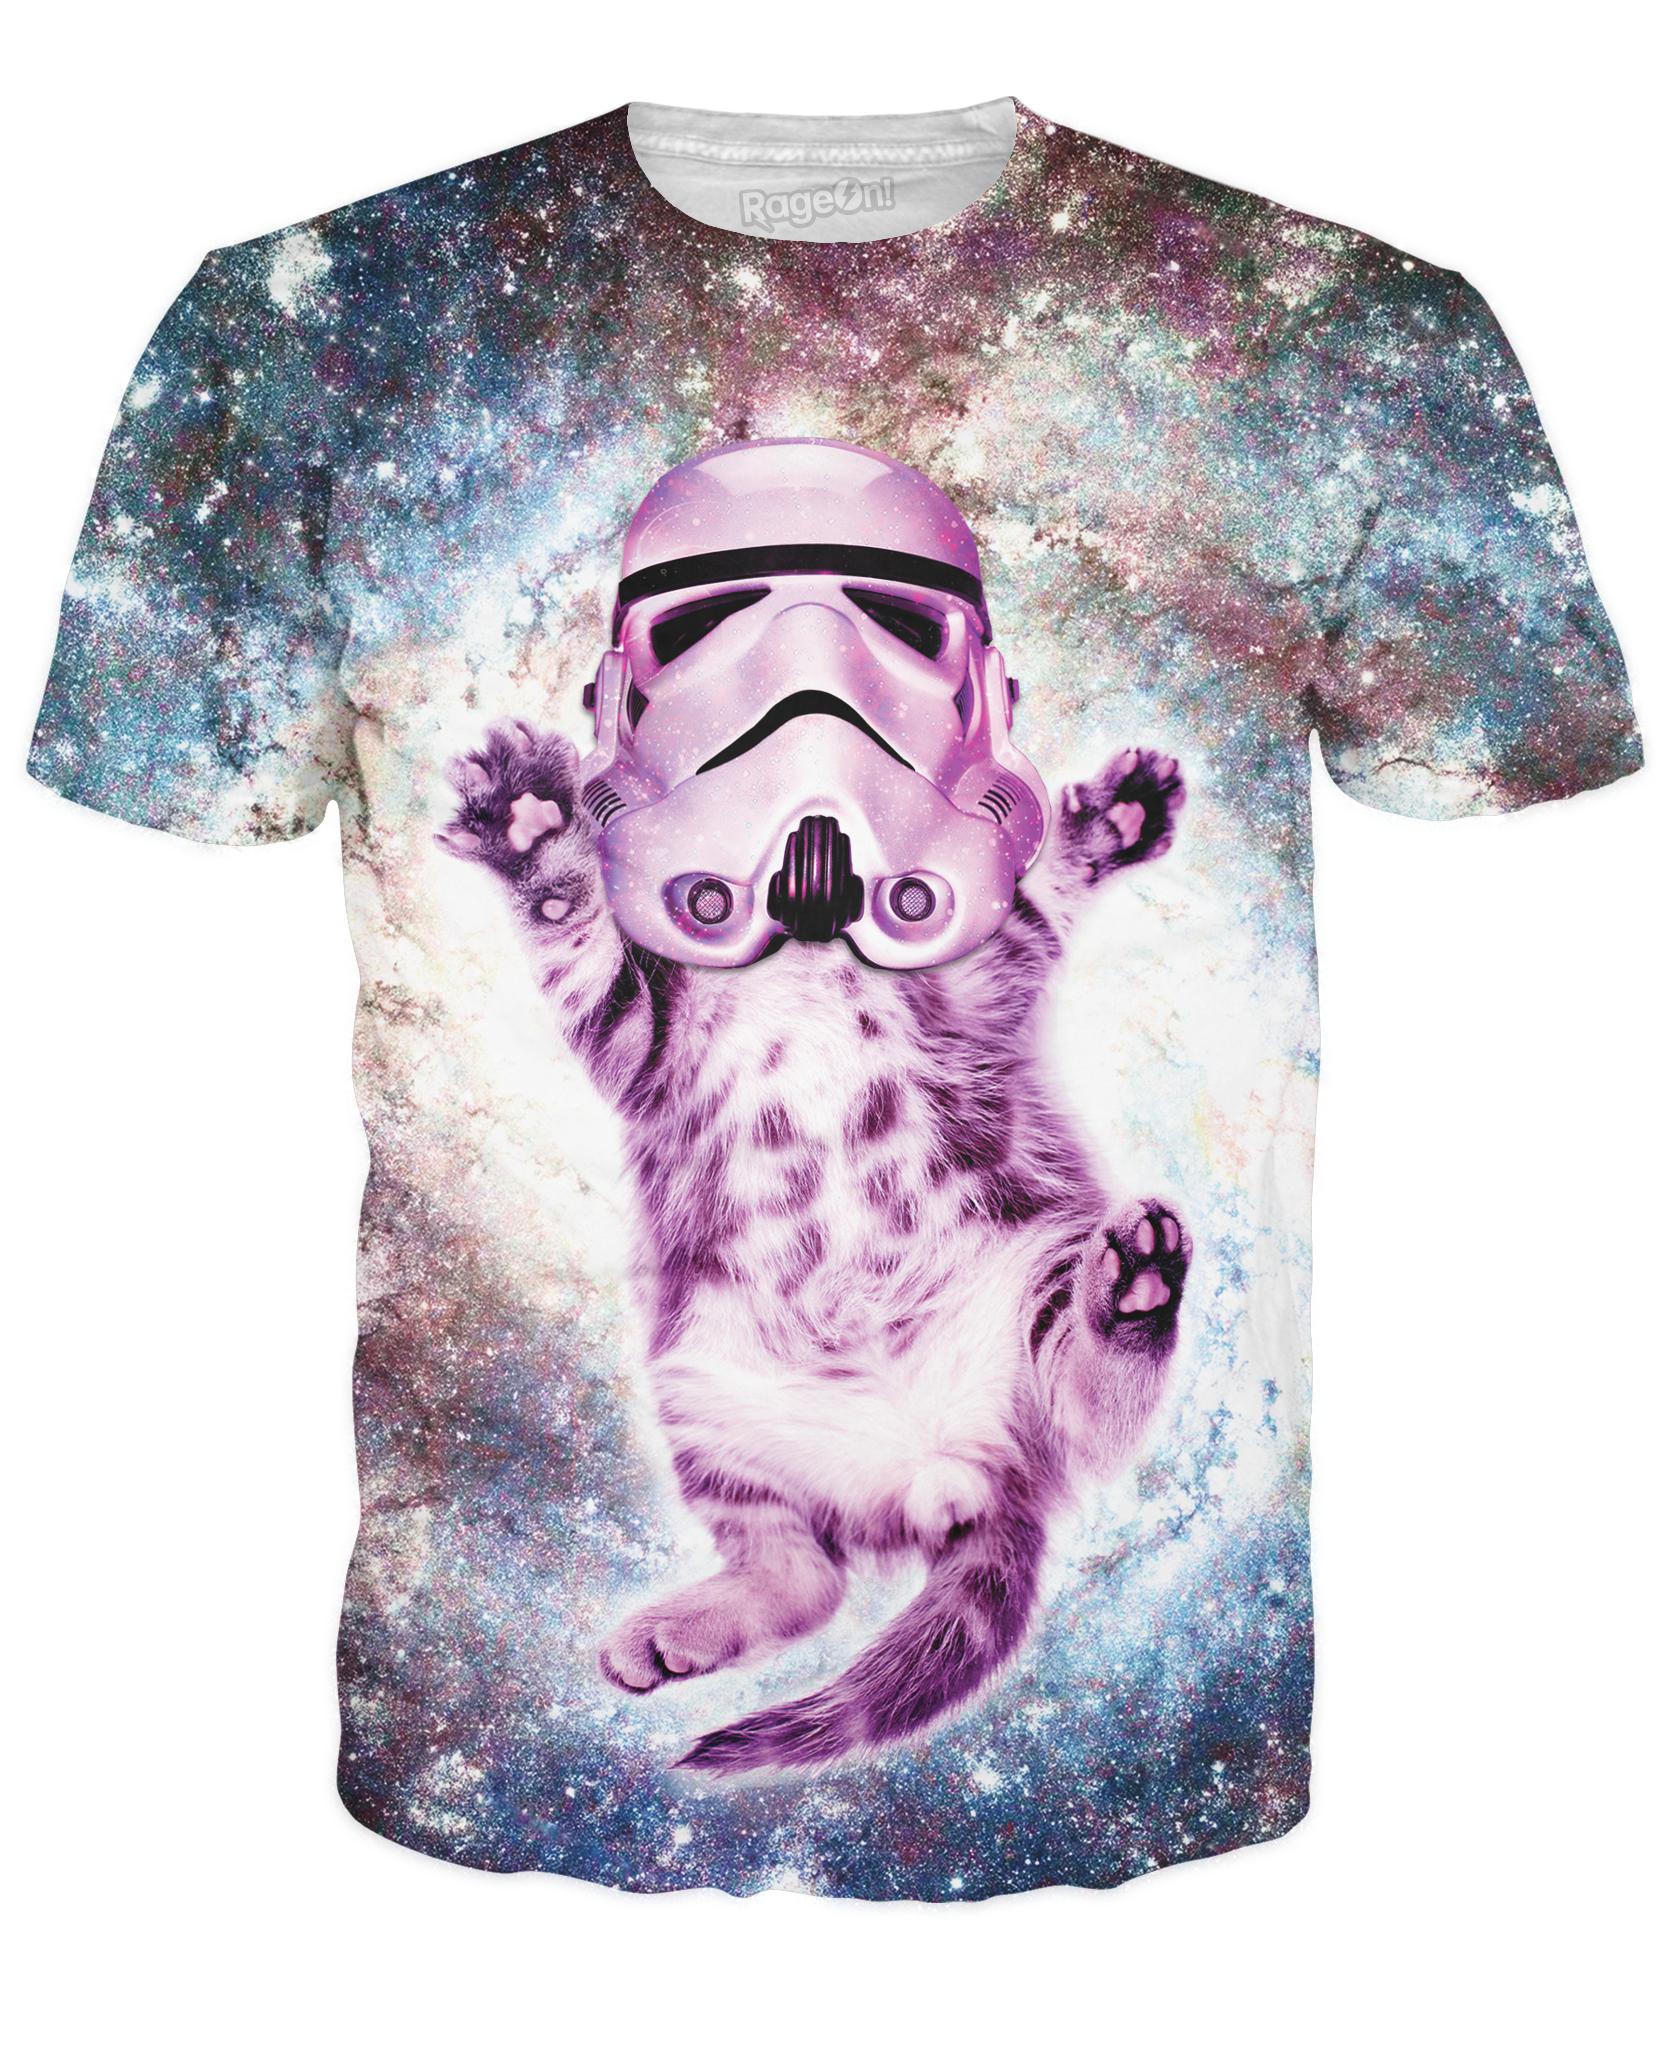 Helmet Cat T Shirt Casual T Shirts Galaxy T Shirt 3d T Shirts